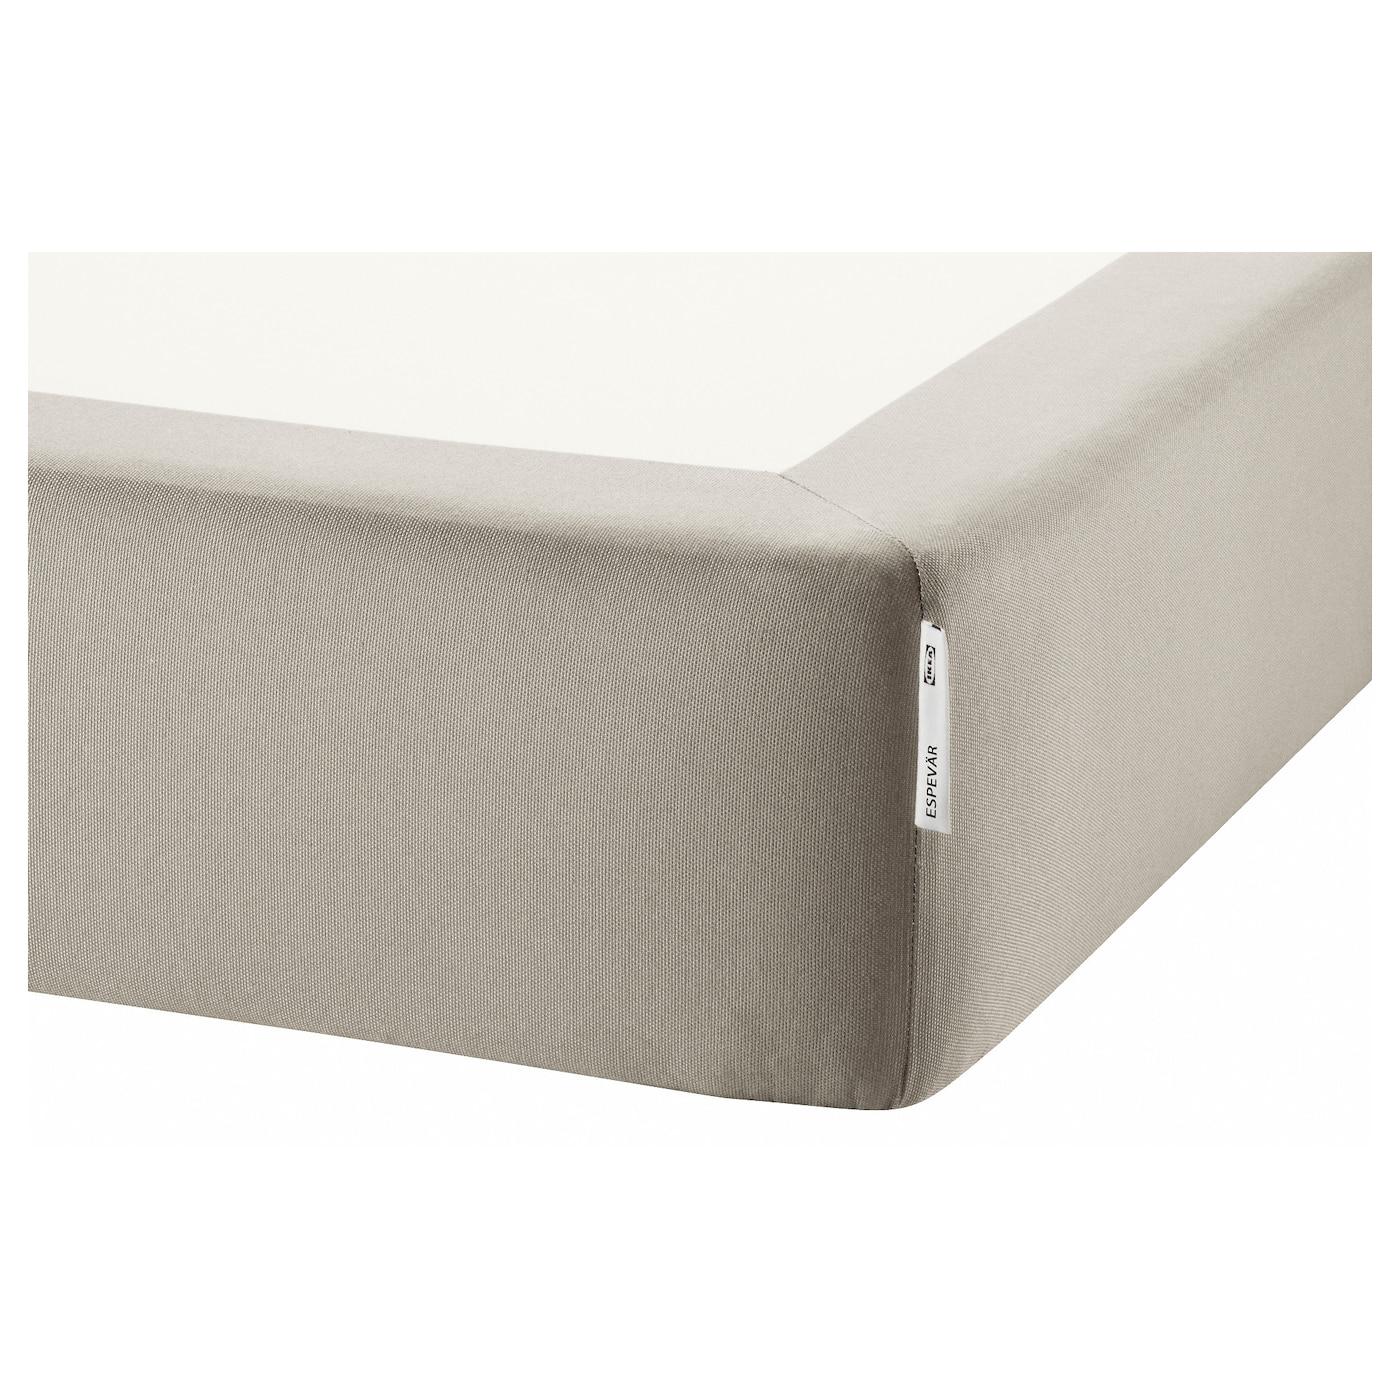 espev r matrasbodem met binnenvering beige 90x200 cm ikea. Black Bedroom Furniture Sets. Home Design Ideas